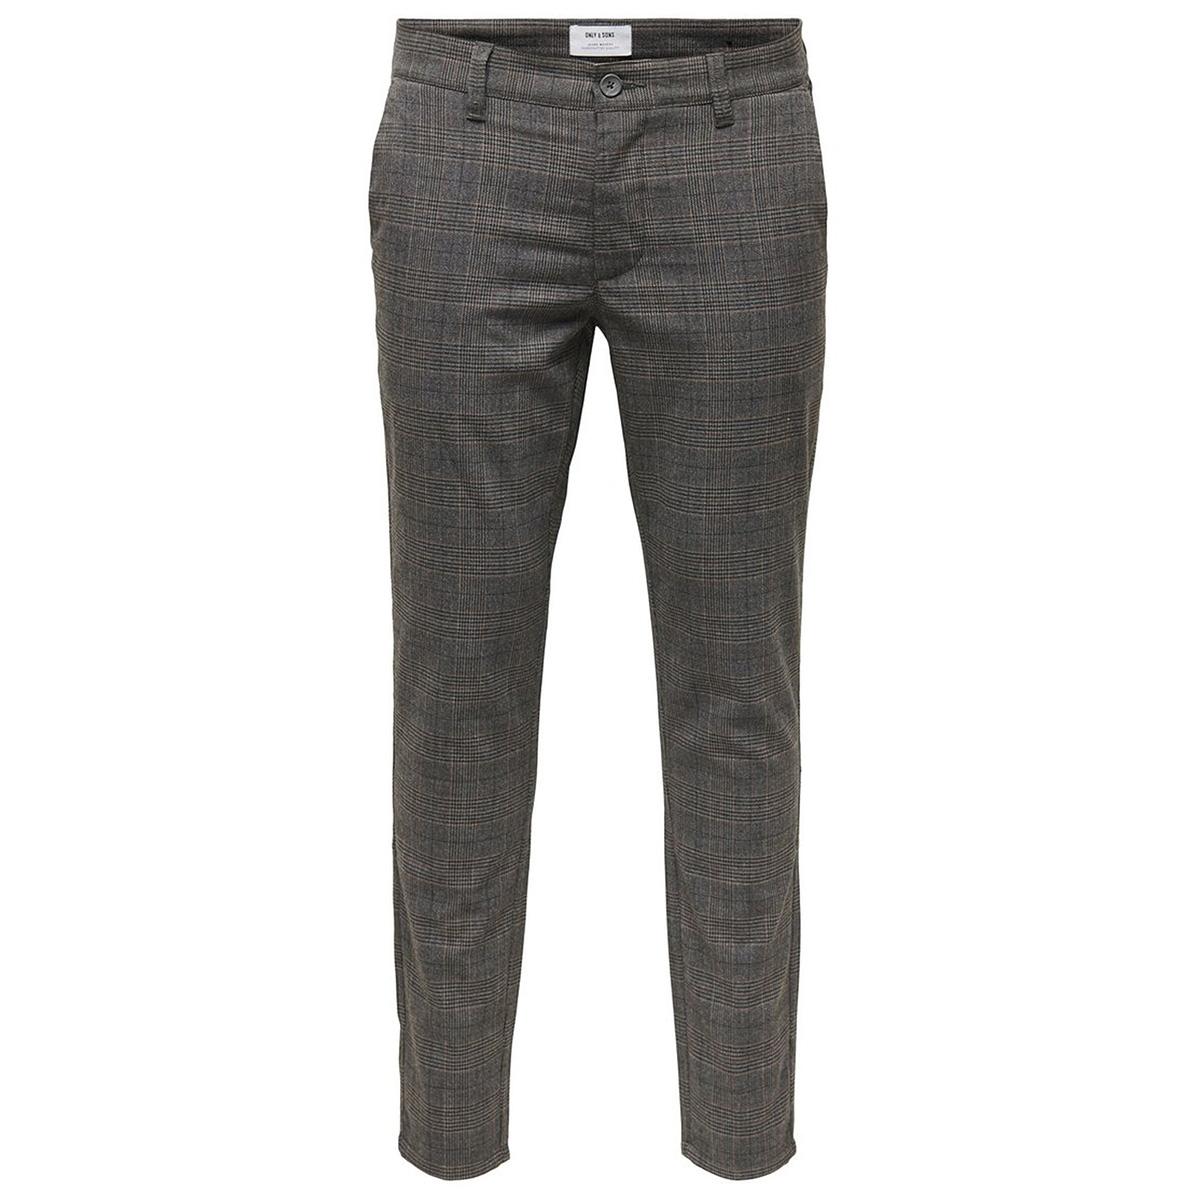 onsmark check pant gw 4198 22014198 only & sons broek medium grey melange